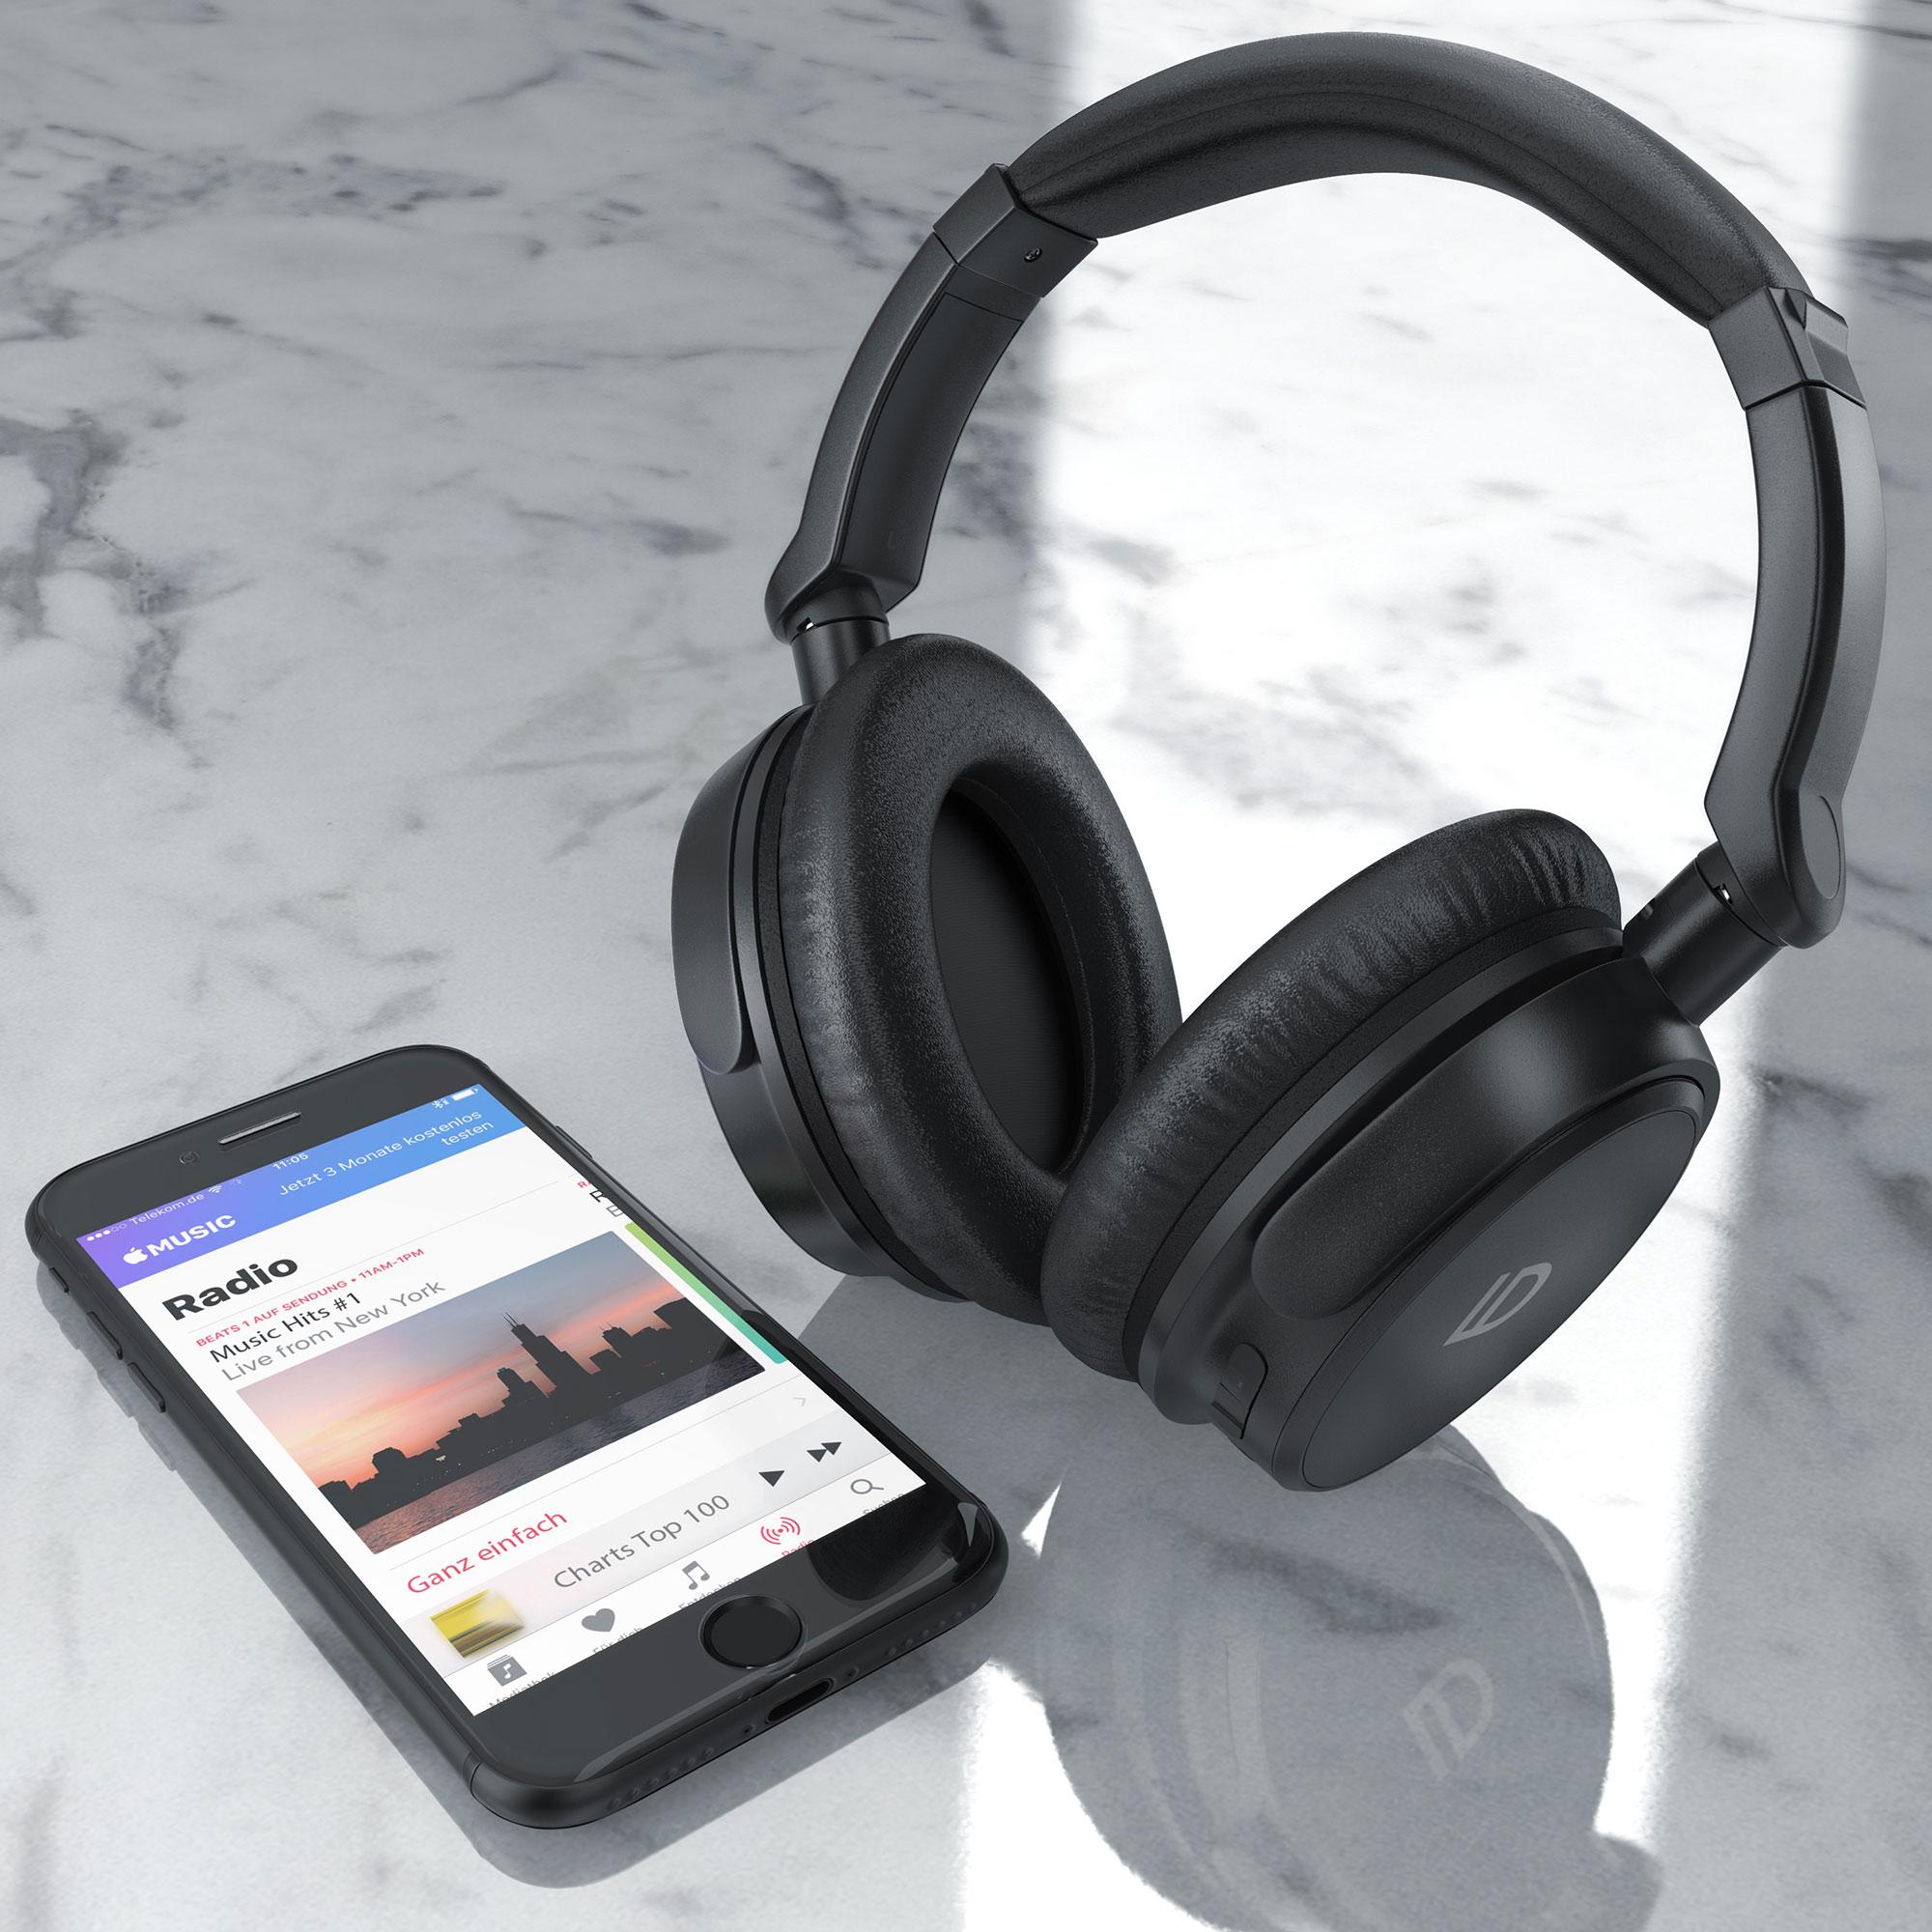 303024--LD-overear-headphones-handy-hell.jpg